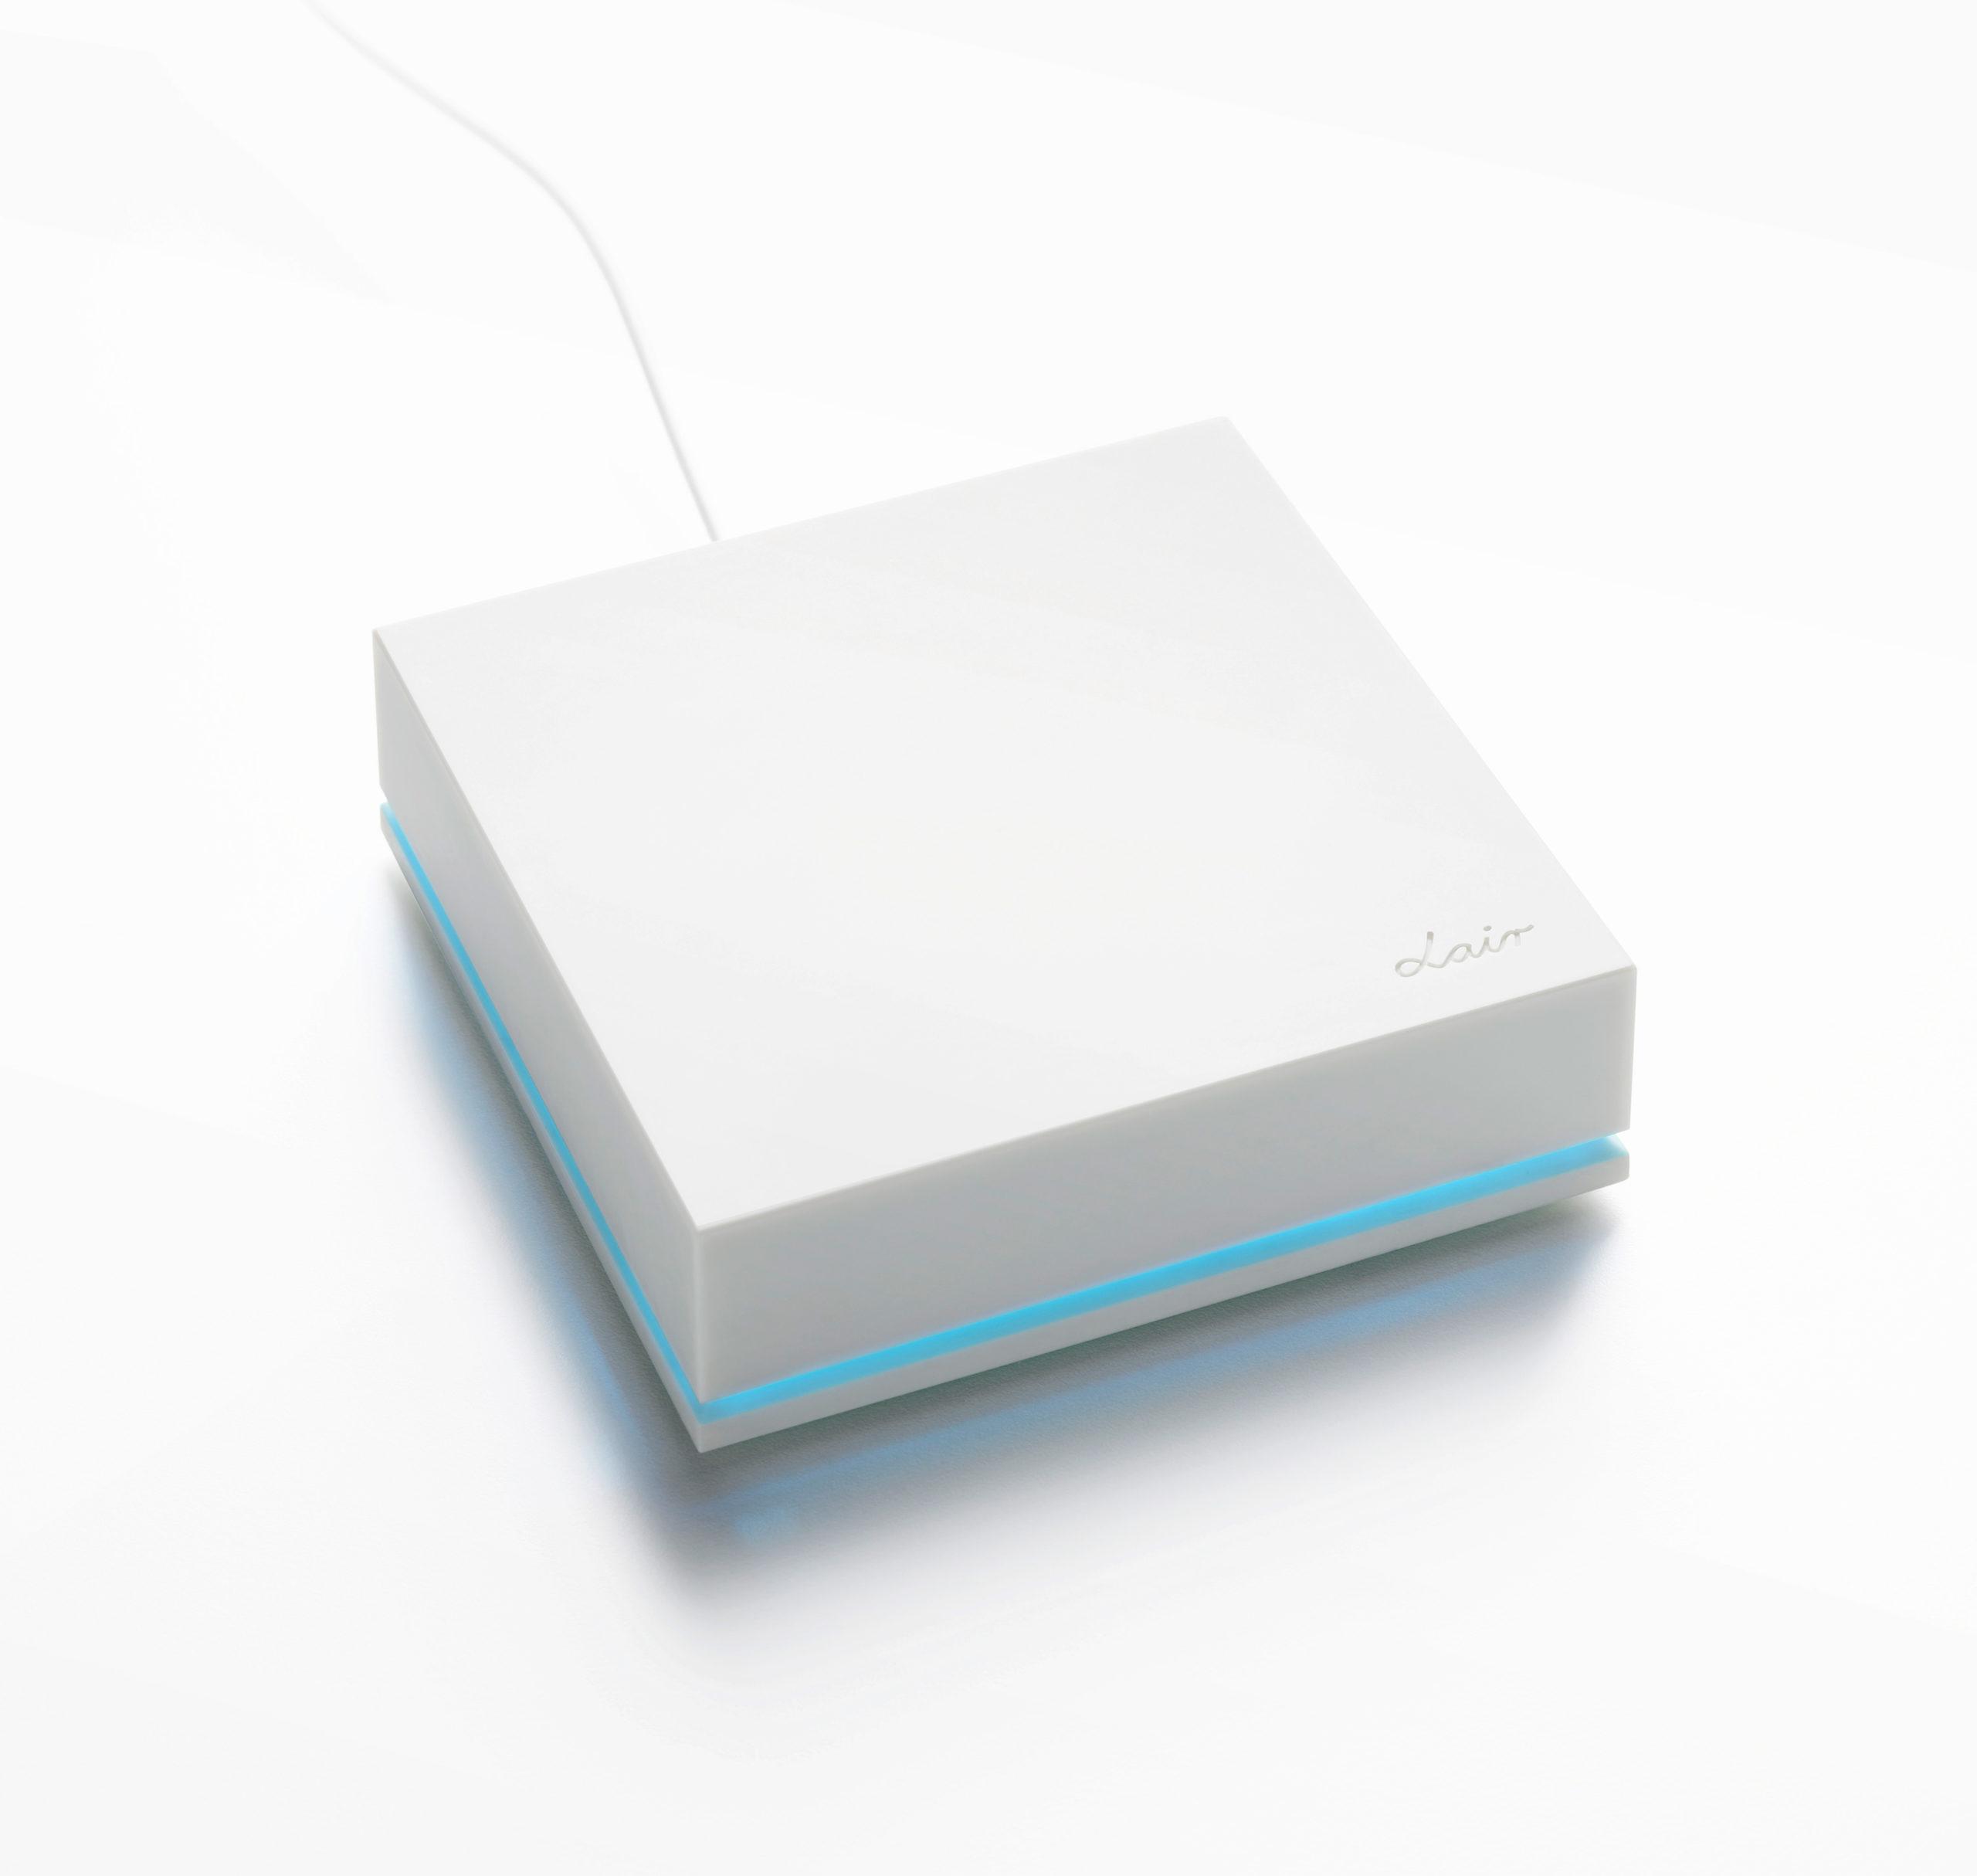 Lair_Product_01_blue_2_web